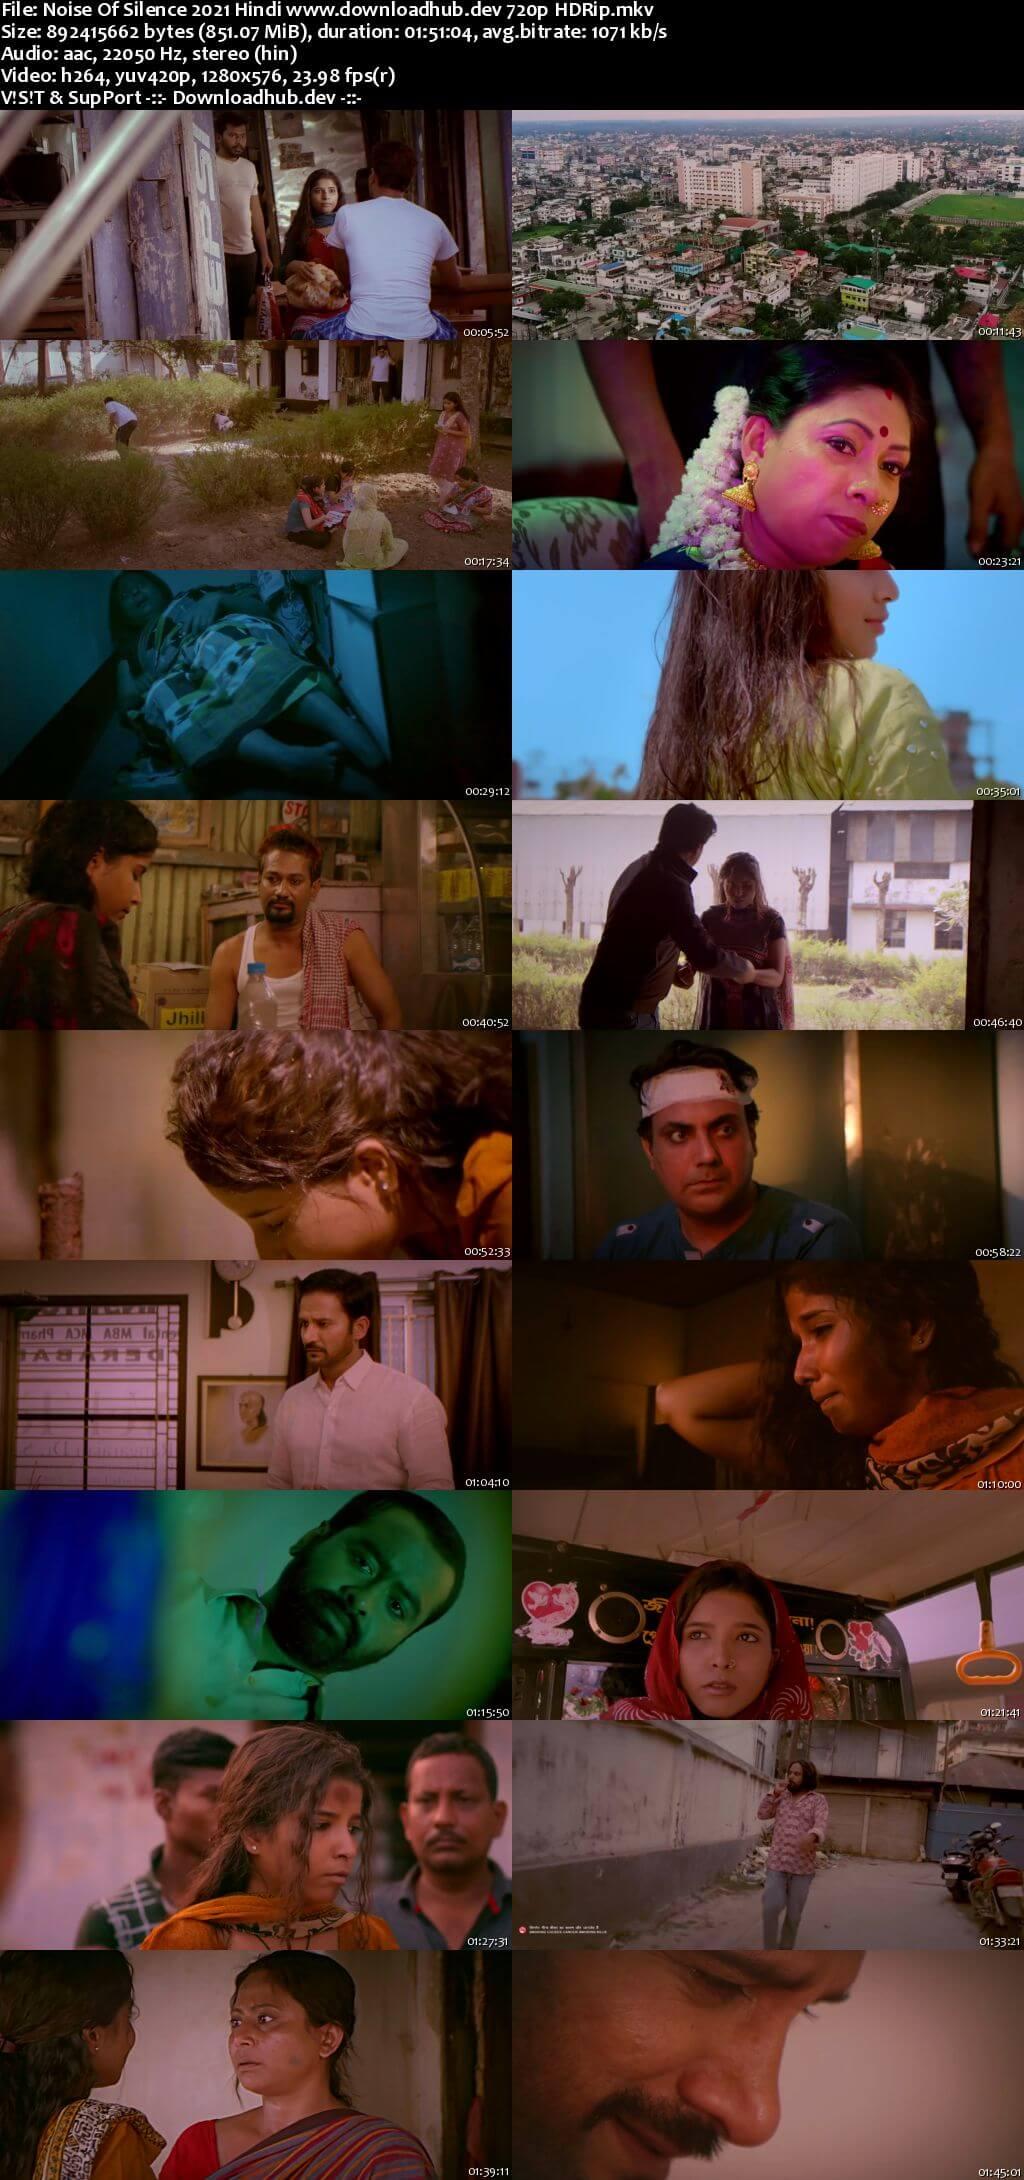 Noise of Silence 2021 Hindi 720p HDRip x264